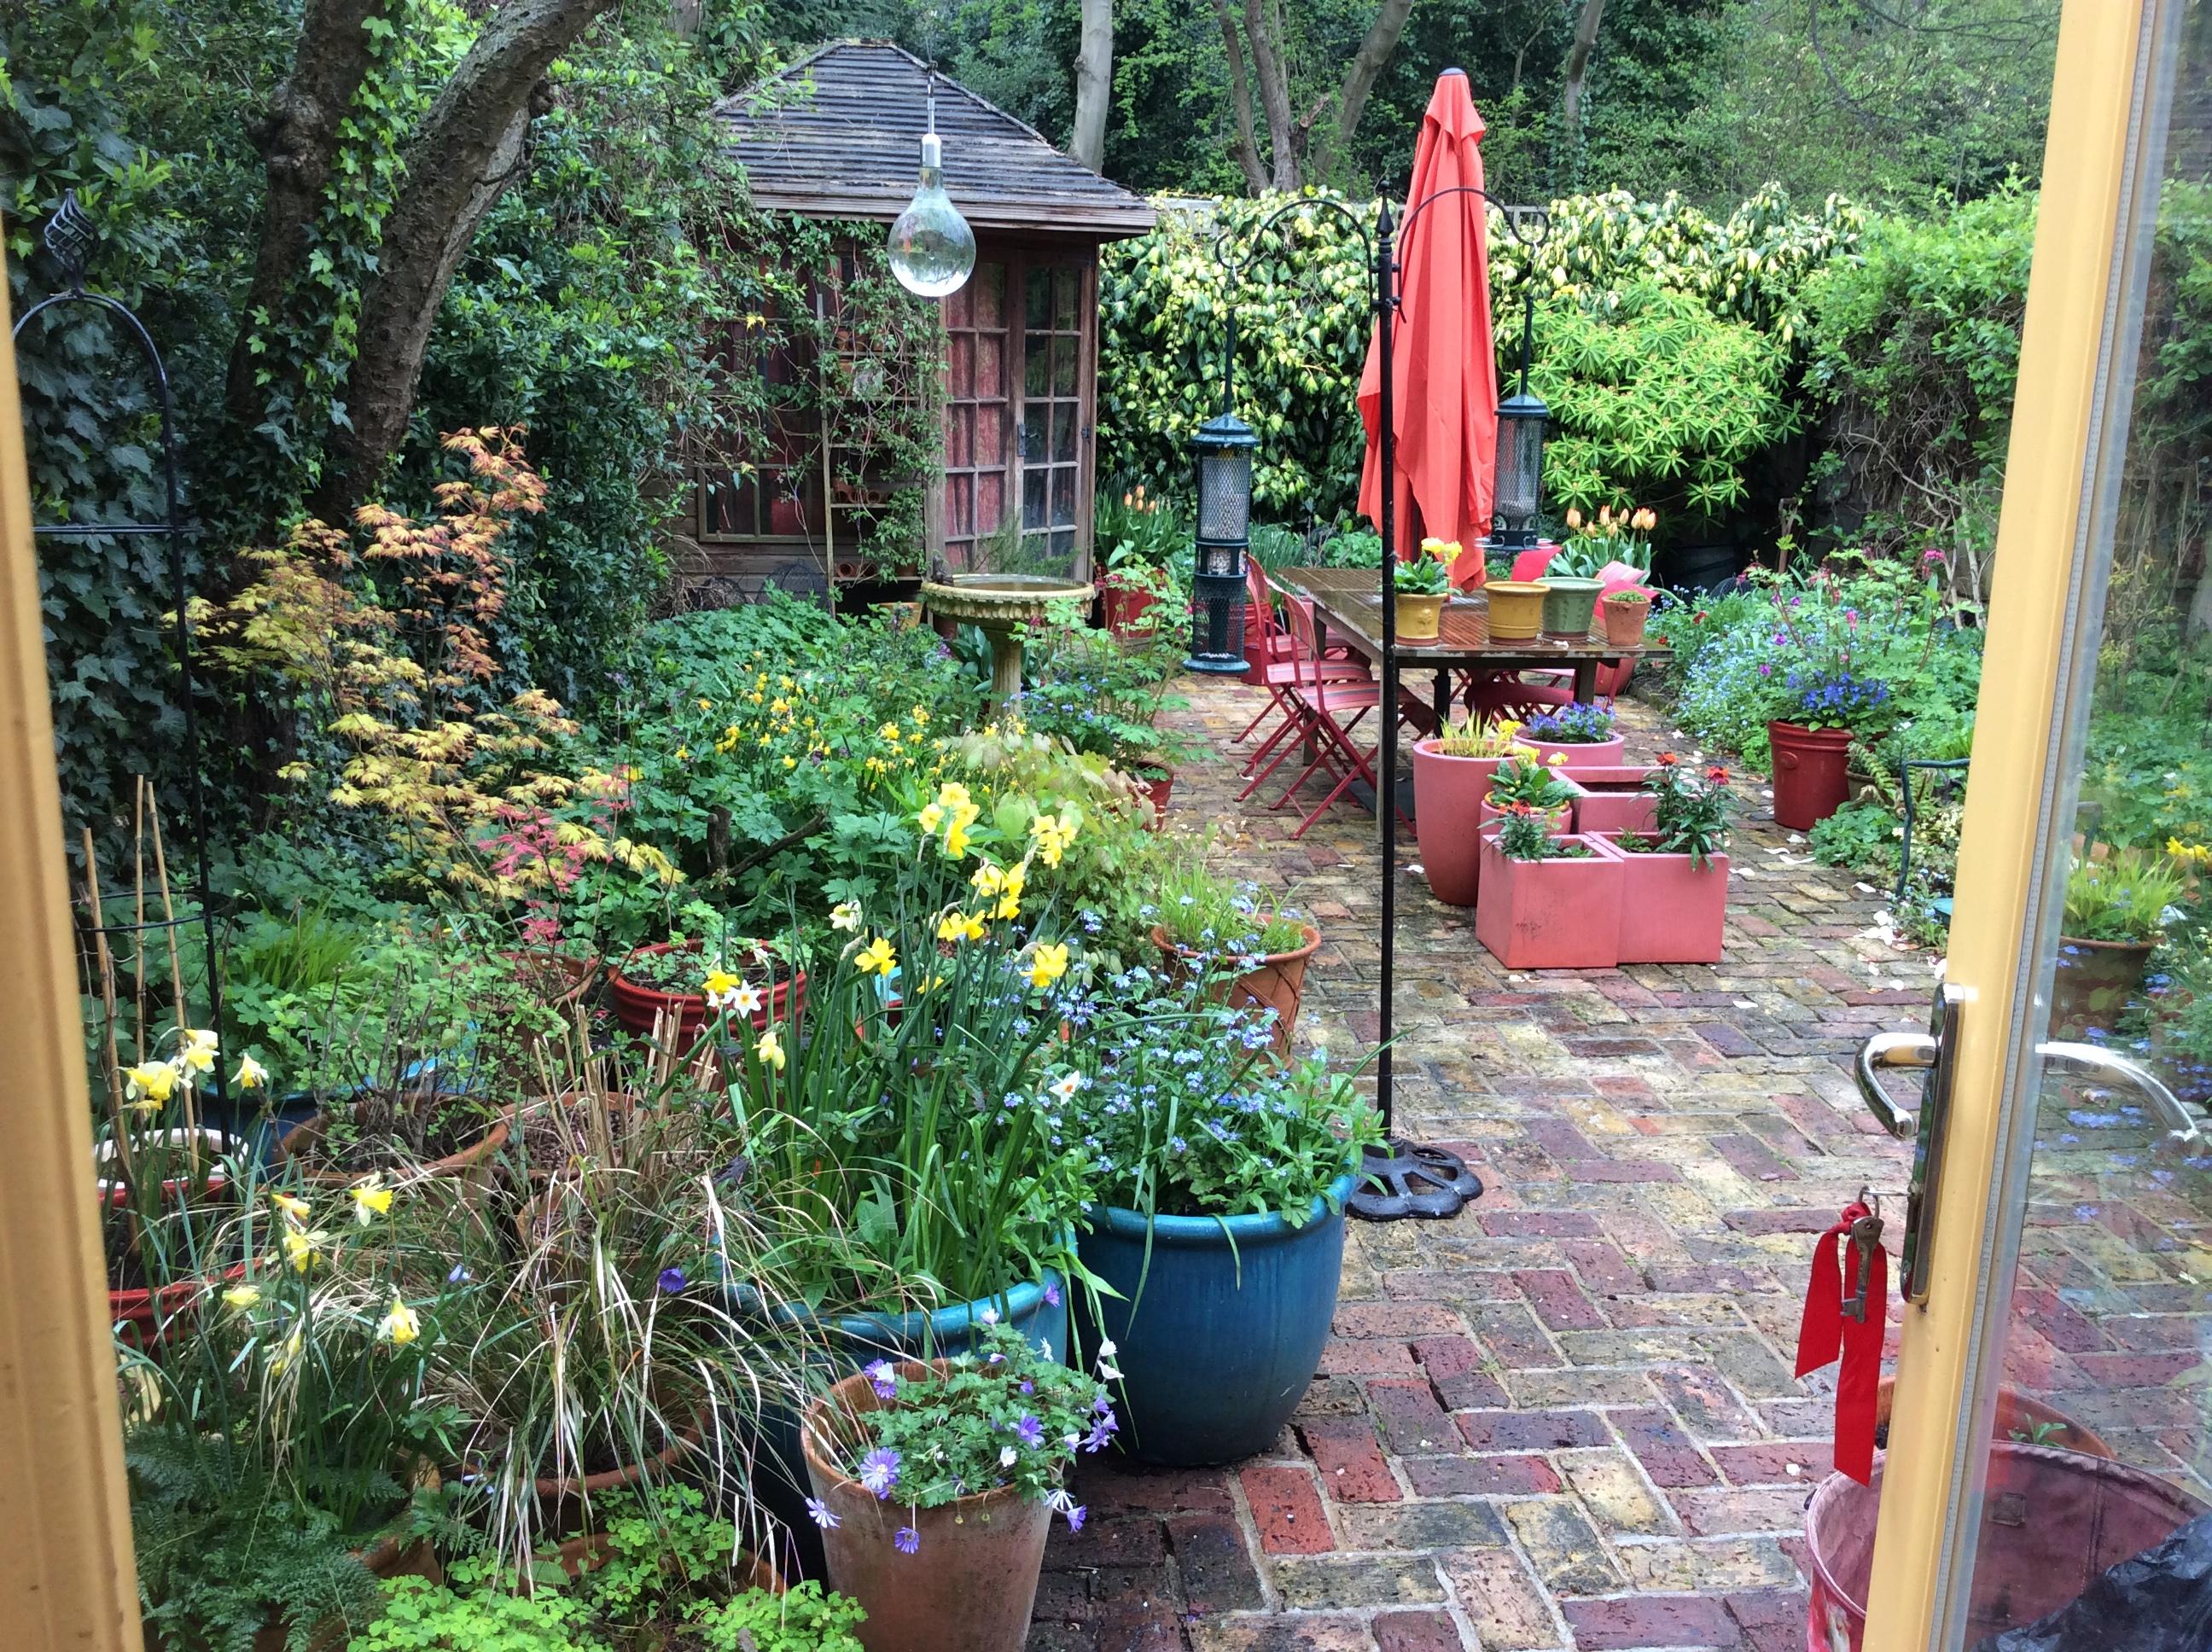 backyard London cottage garden